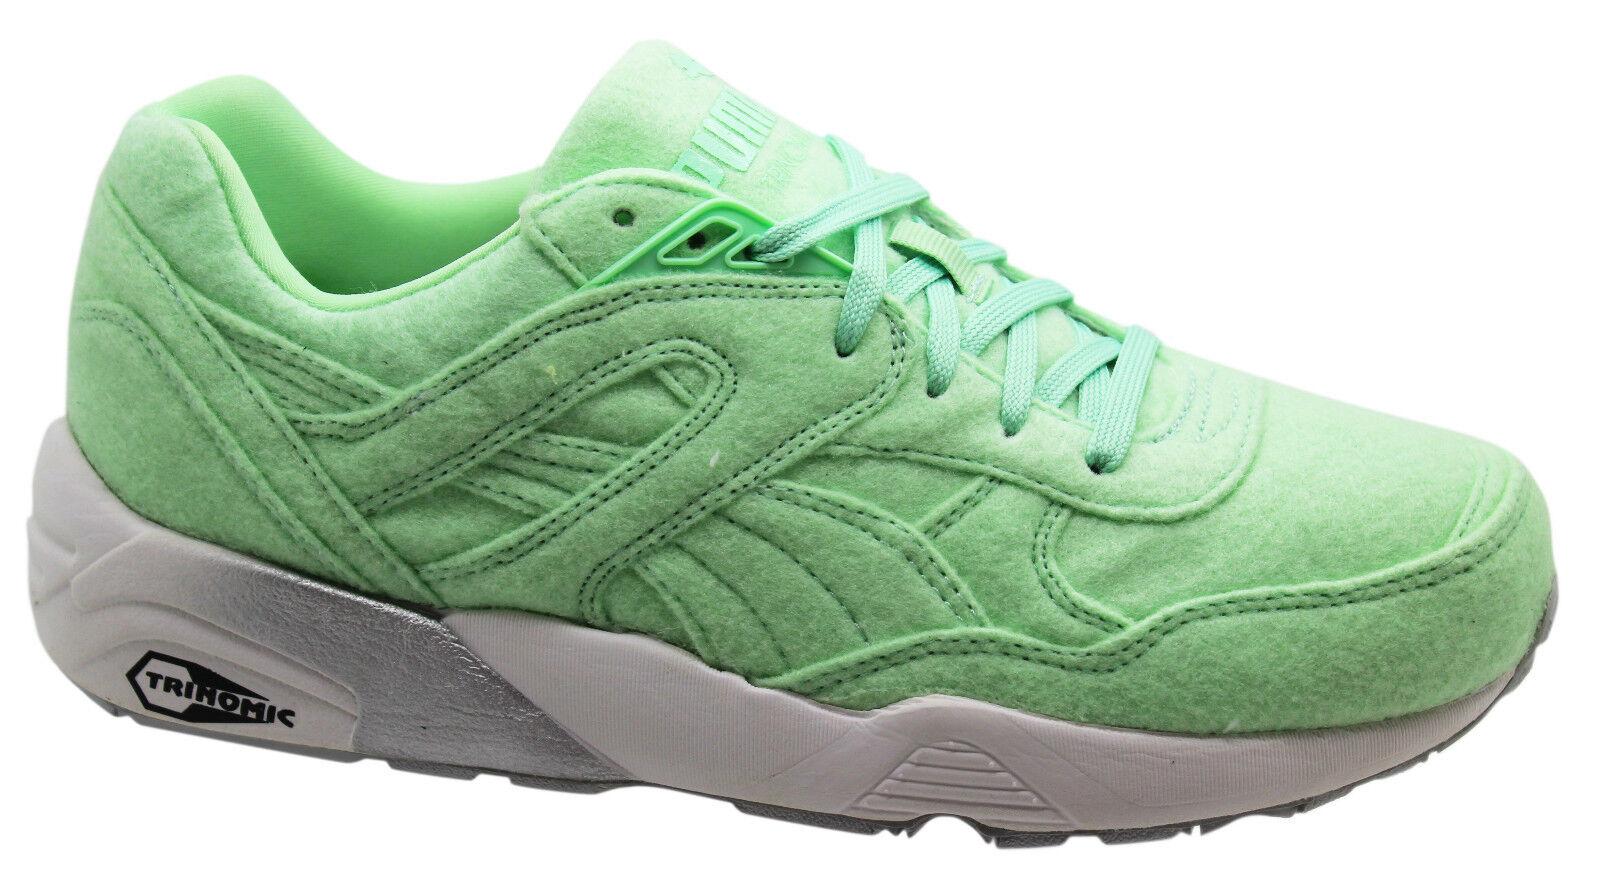 Puma Trinomic R698 Bright Wool Pack Men Trainers Running Shoes 358832 04 U20